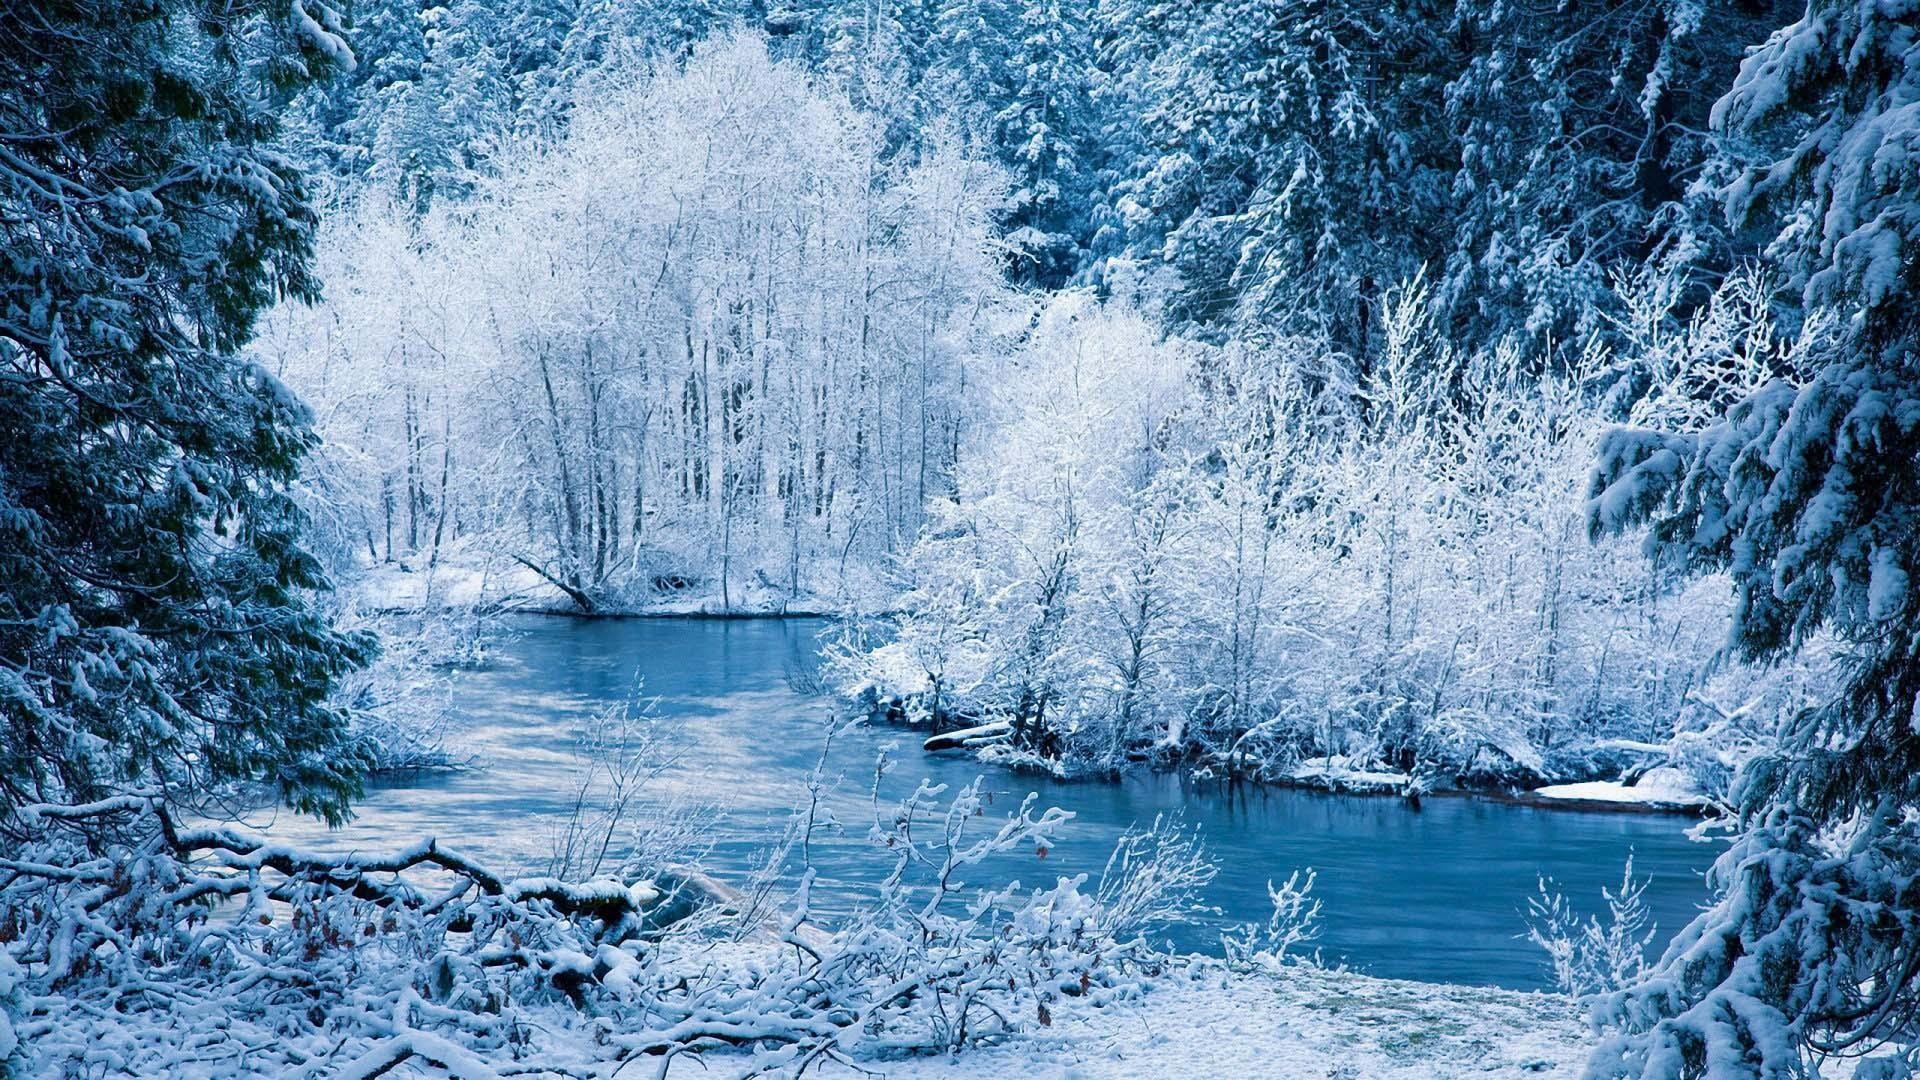 wallpaper.wiki-Pictures-Winter-Download-Desktop-PIC-WPE00102